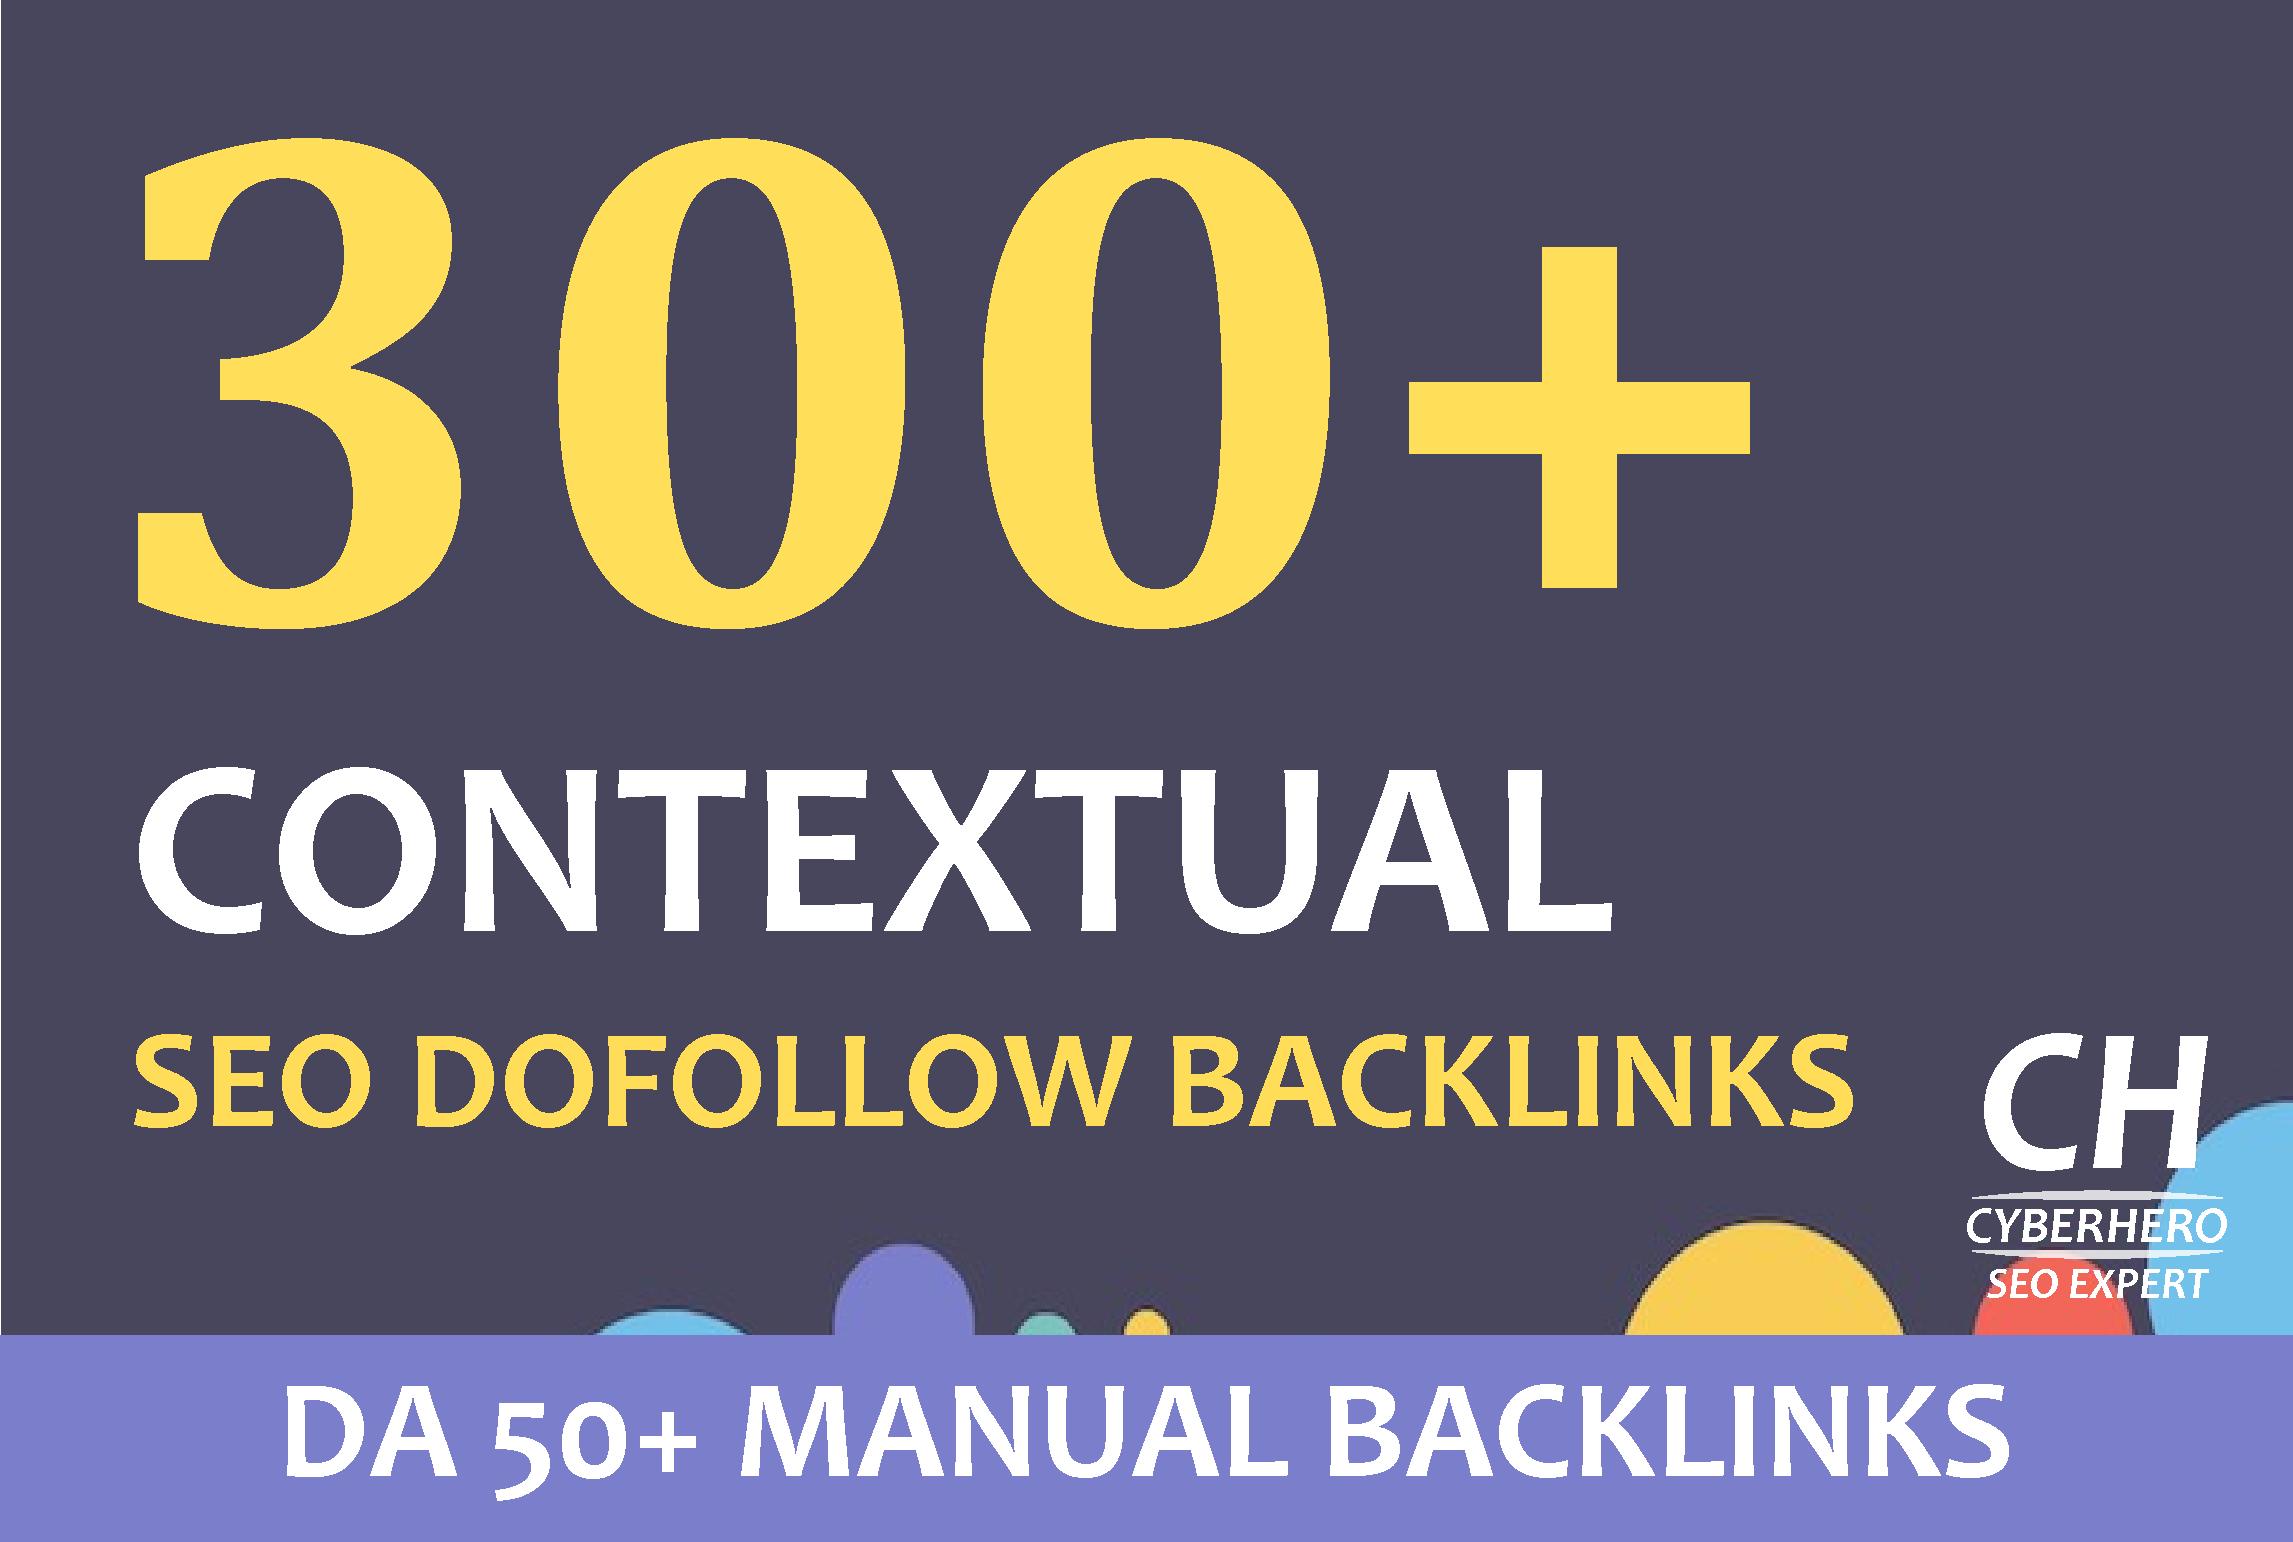 I will make 300 Contextual SEO dofollow backlinks white hat seo with unique content